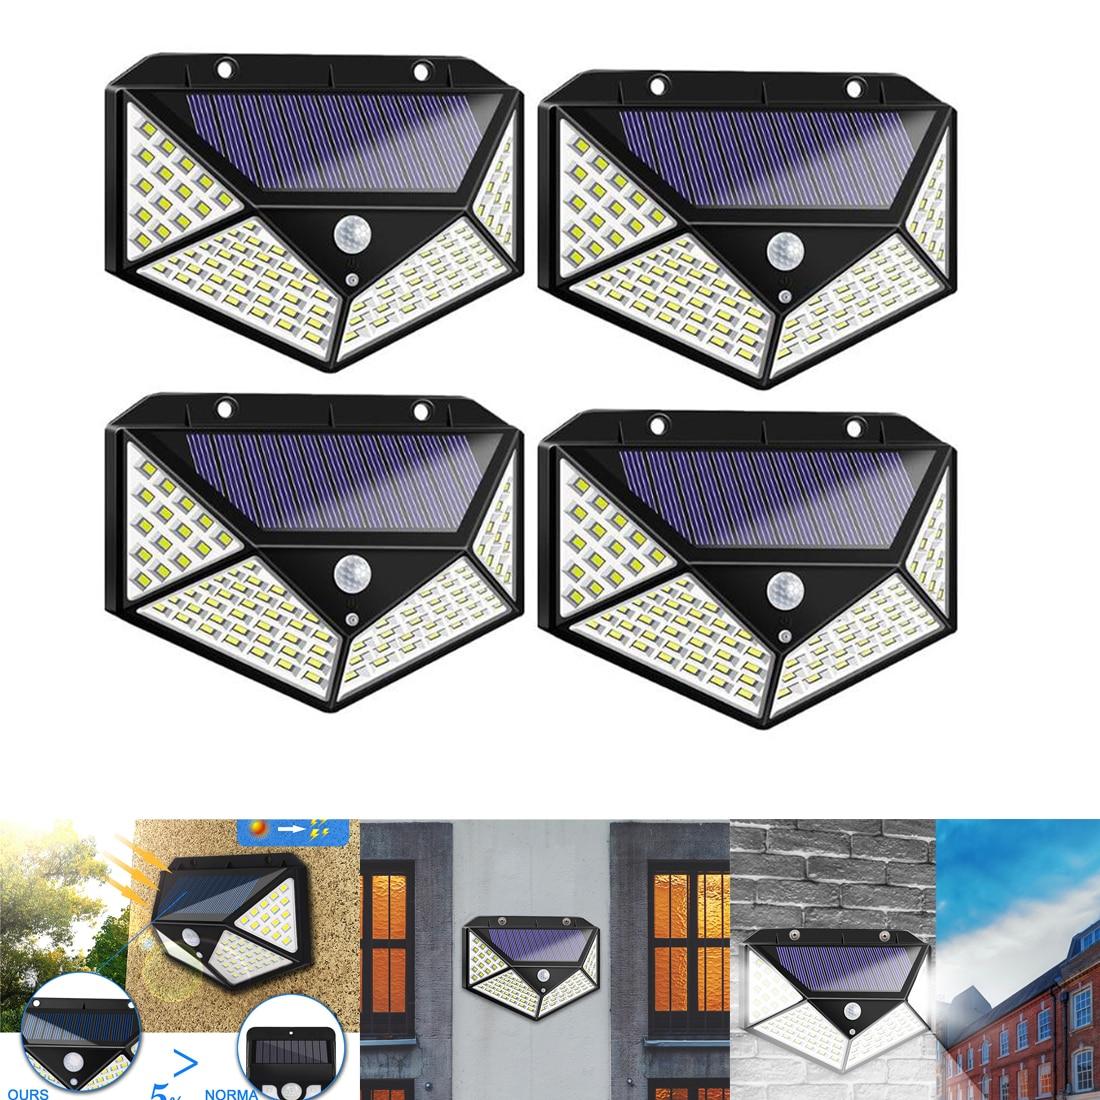 100LED Outdoor Solar Light Motion Sensor Waterproof Yard Security LED Solar Lamp For Outdoor Garden Street Lights Dropshipping